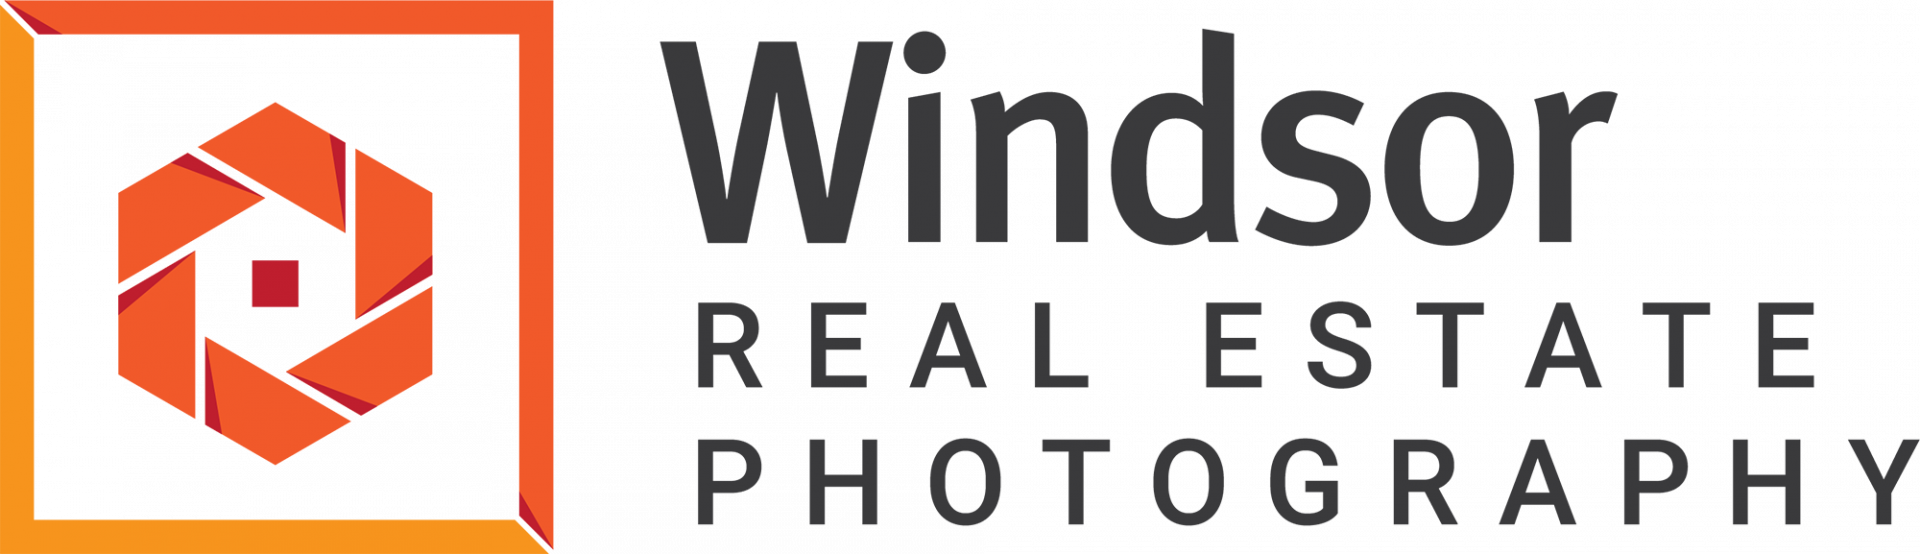 WINDSOR REAL ESTATE PHOTOGRAPHY